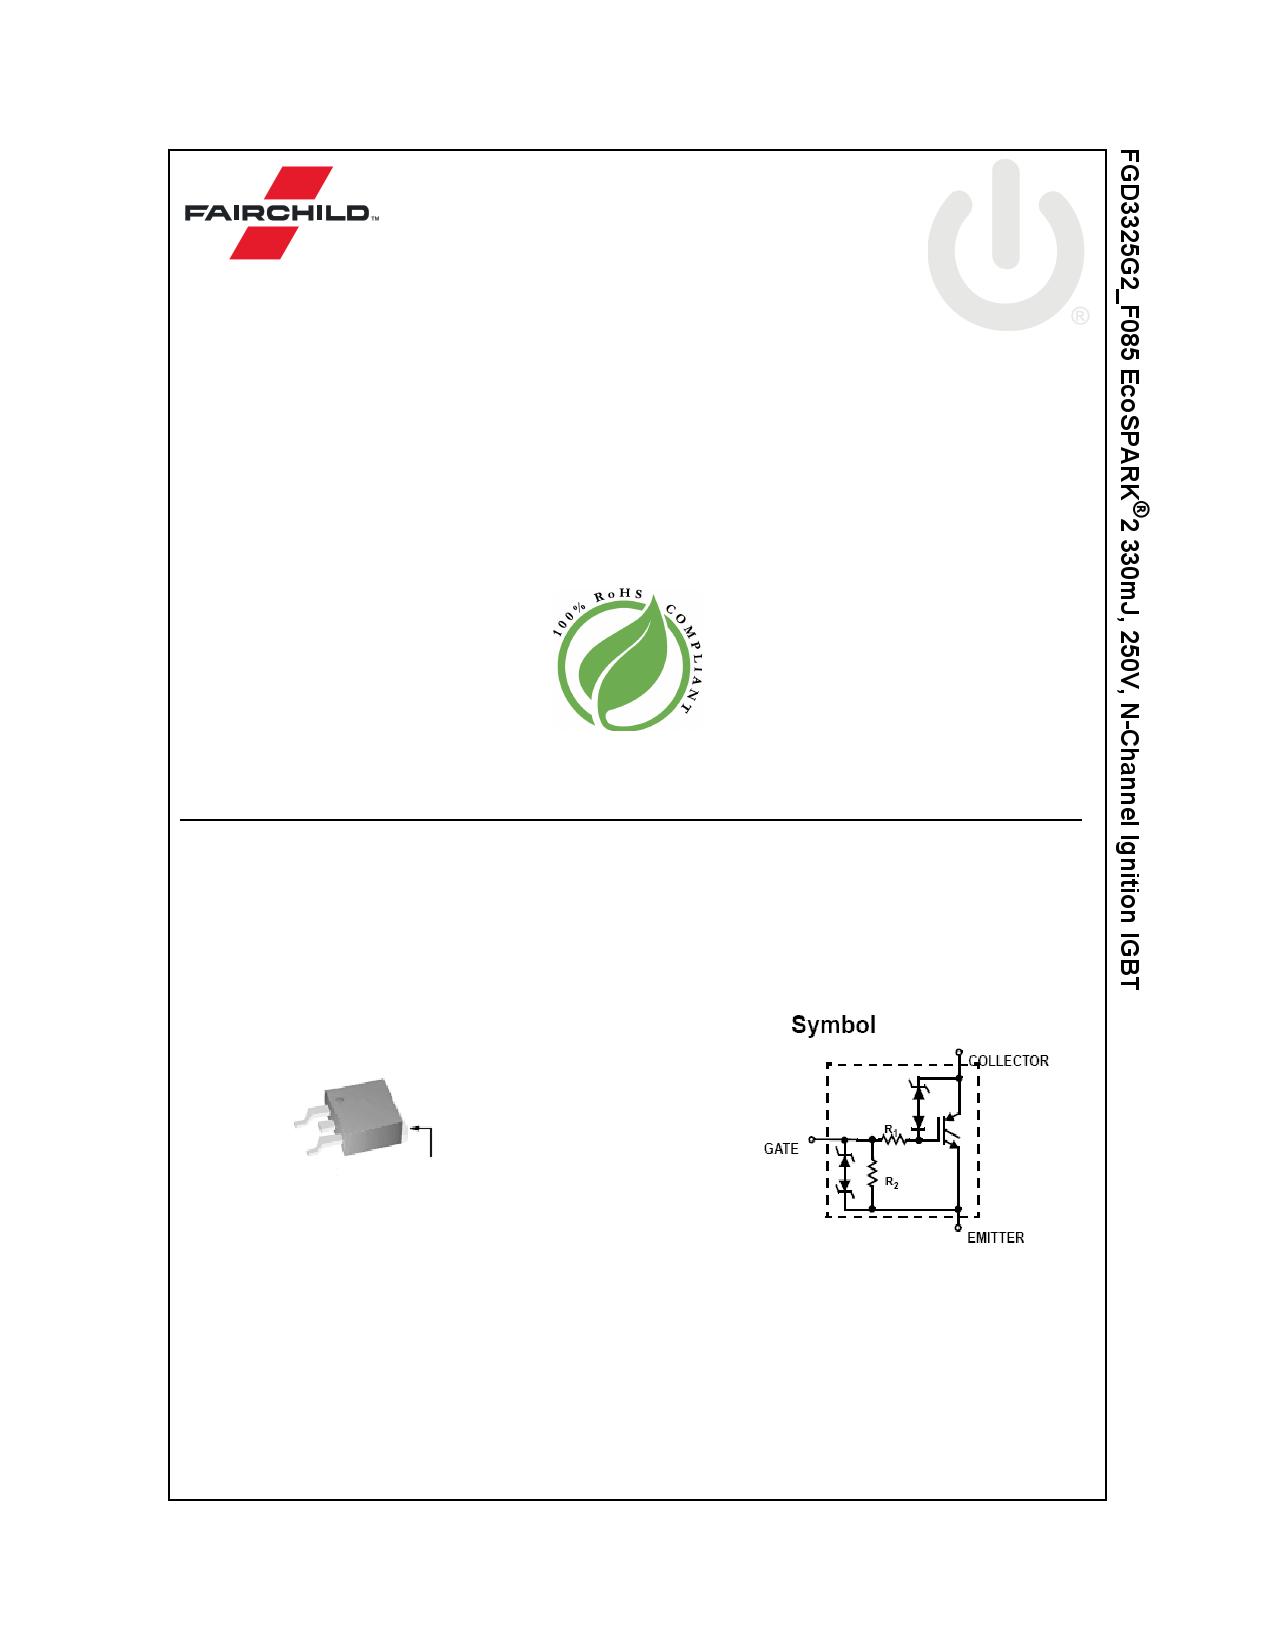 FGD3325G2_F085 데이터시트 및 FGD3325G2_F085 PDF